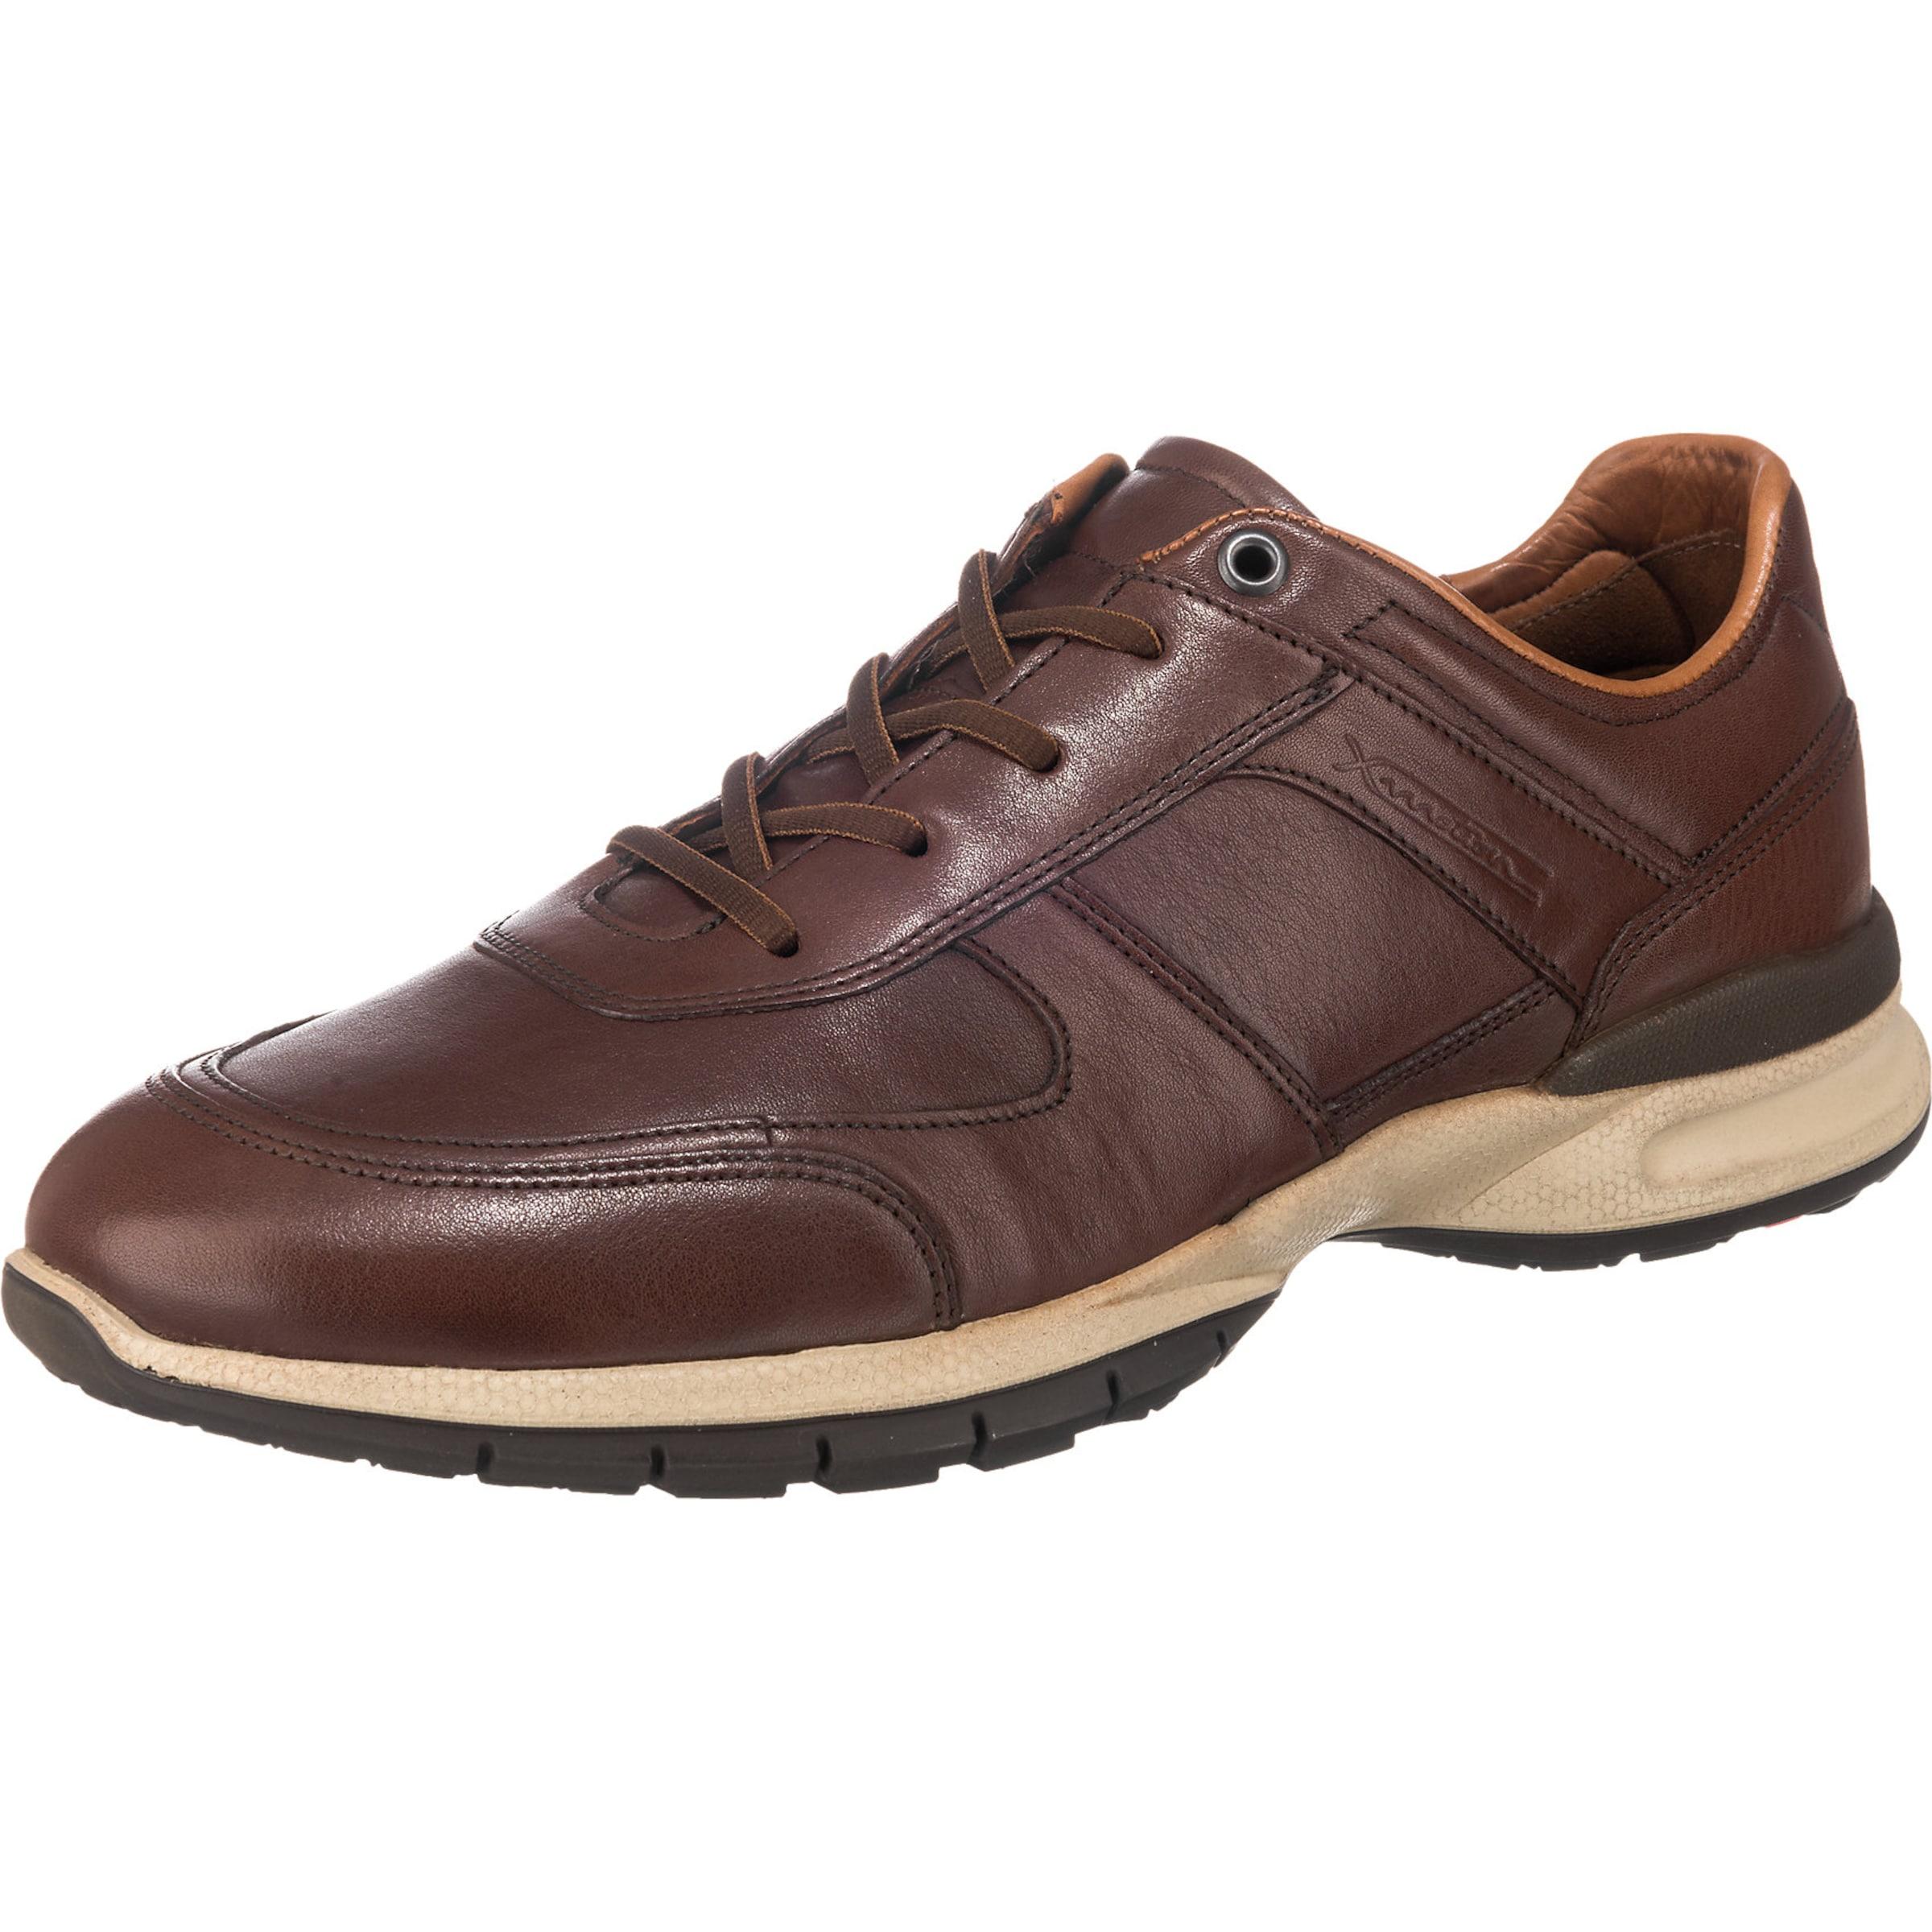 LLOYD Aston Sneakers Verschleißfeste billige Schuhe